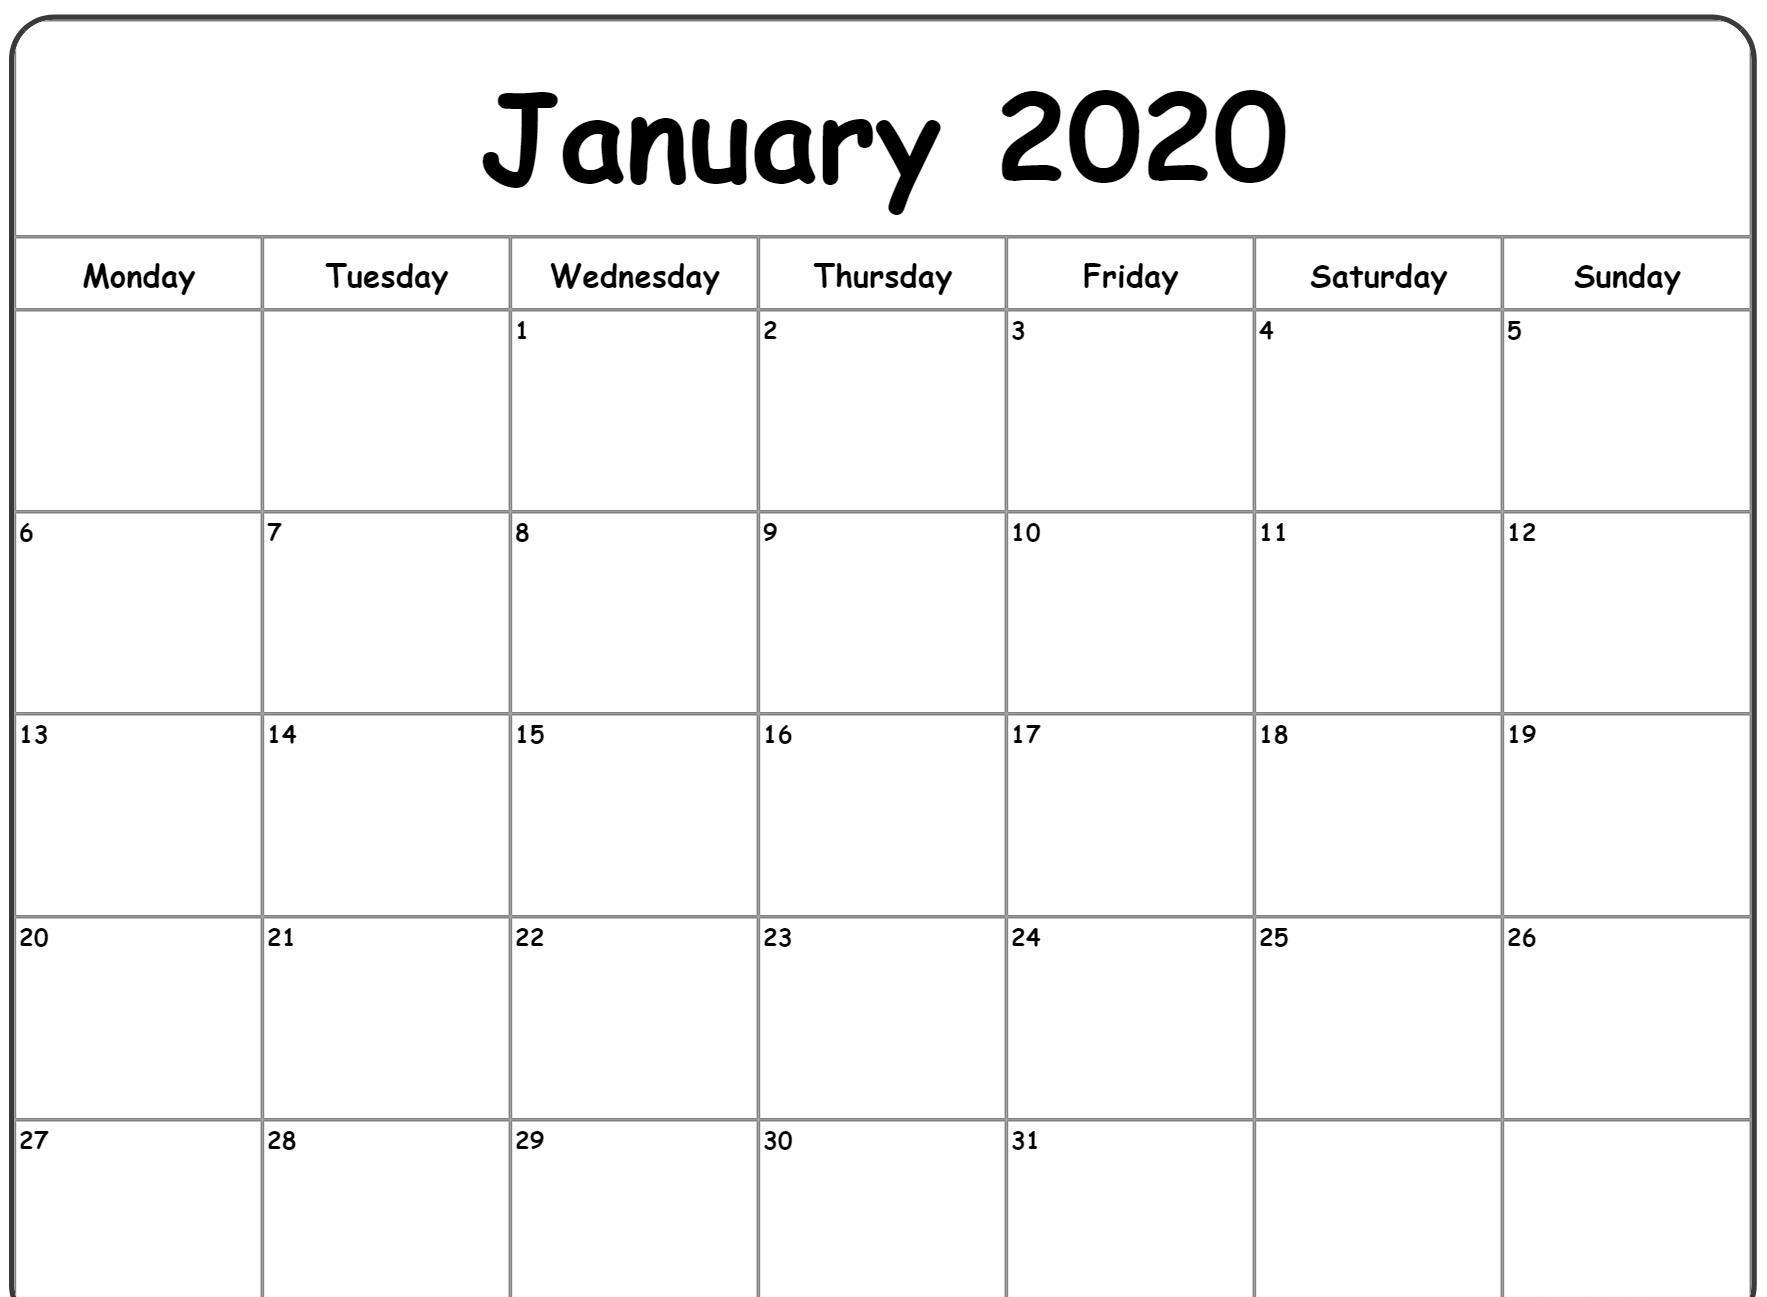 Free Blank January Calendar 2020 Printable Template for Jan 2020 Printable Calendar